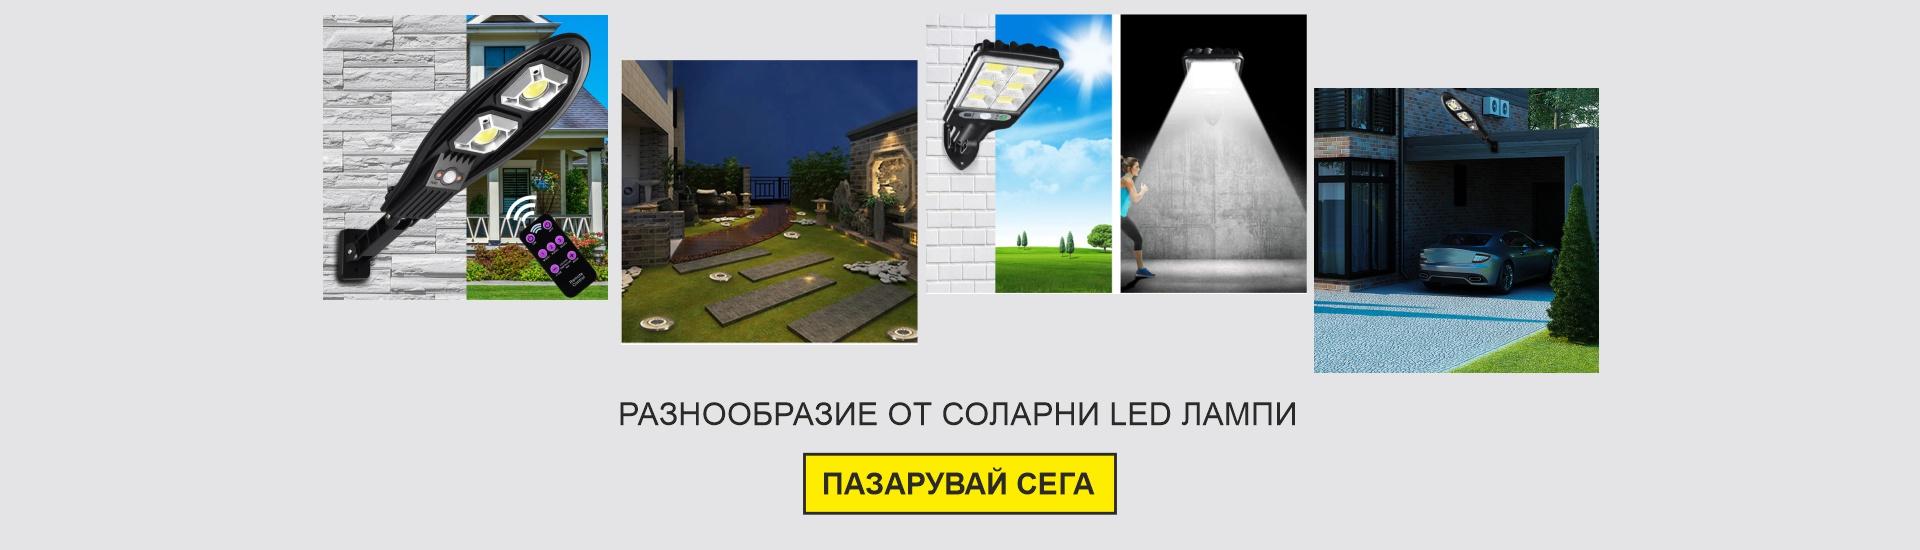 соларни лед лампи